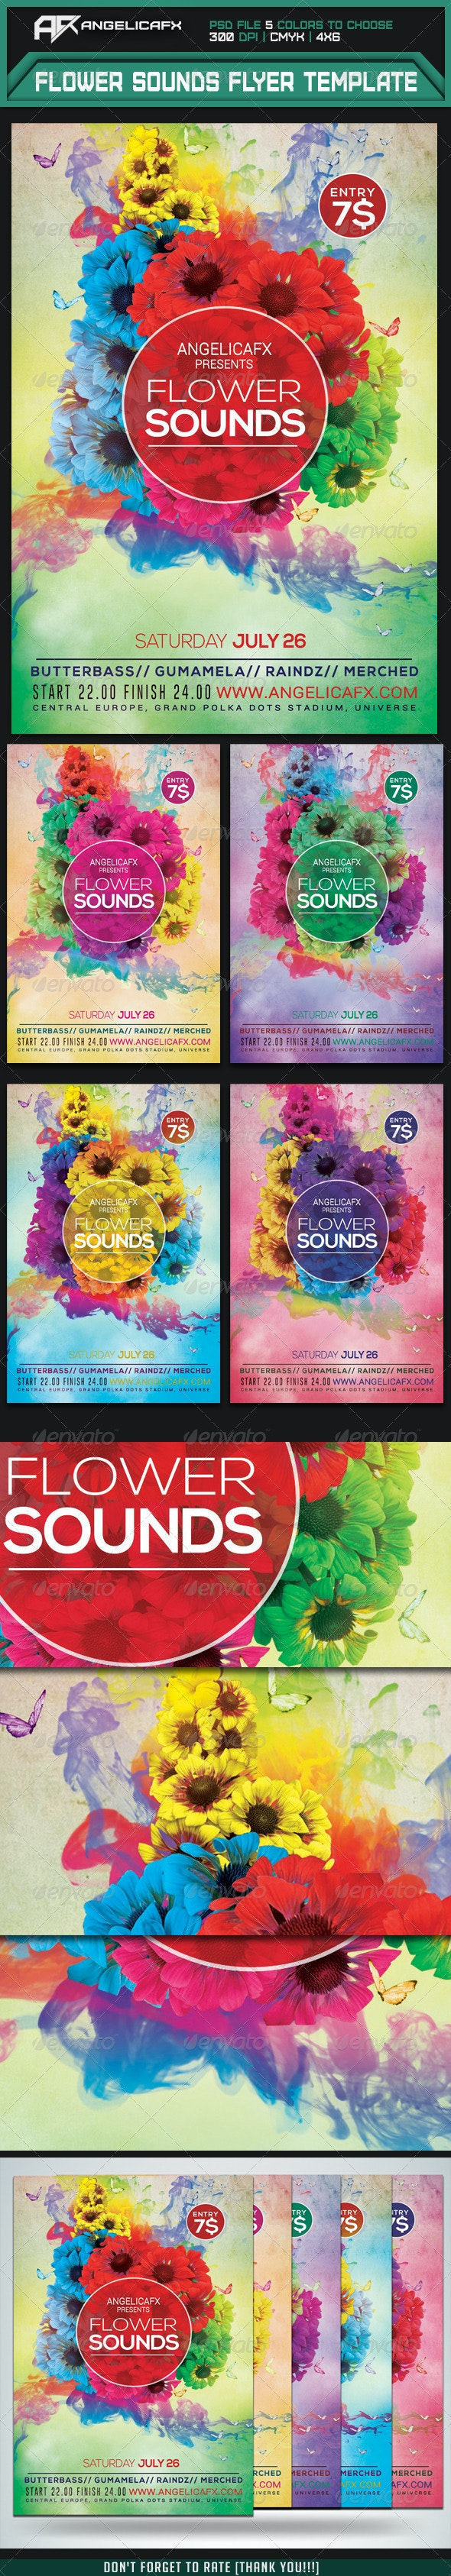 Flower Sounds Flyer Template - Flyers Print Templates